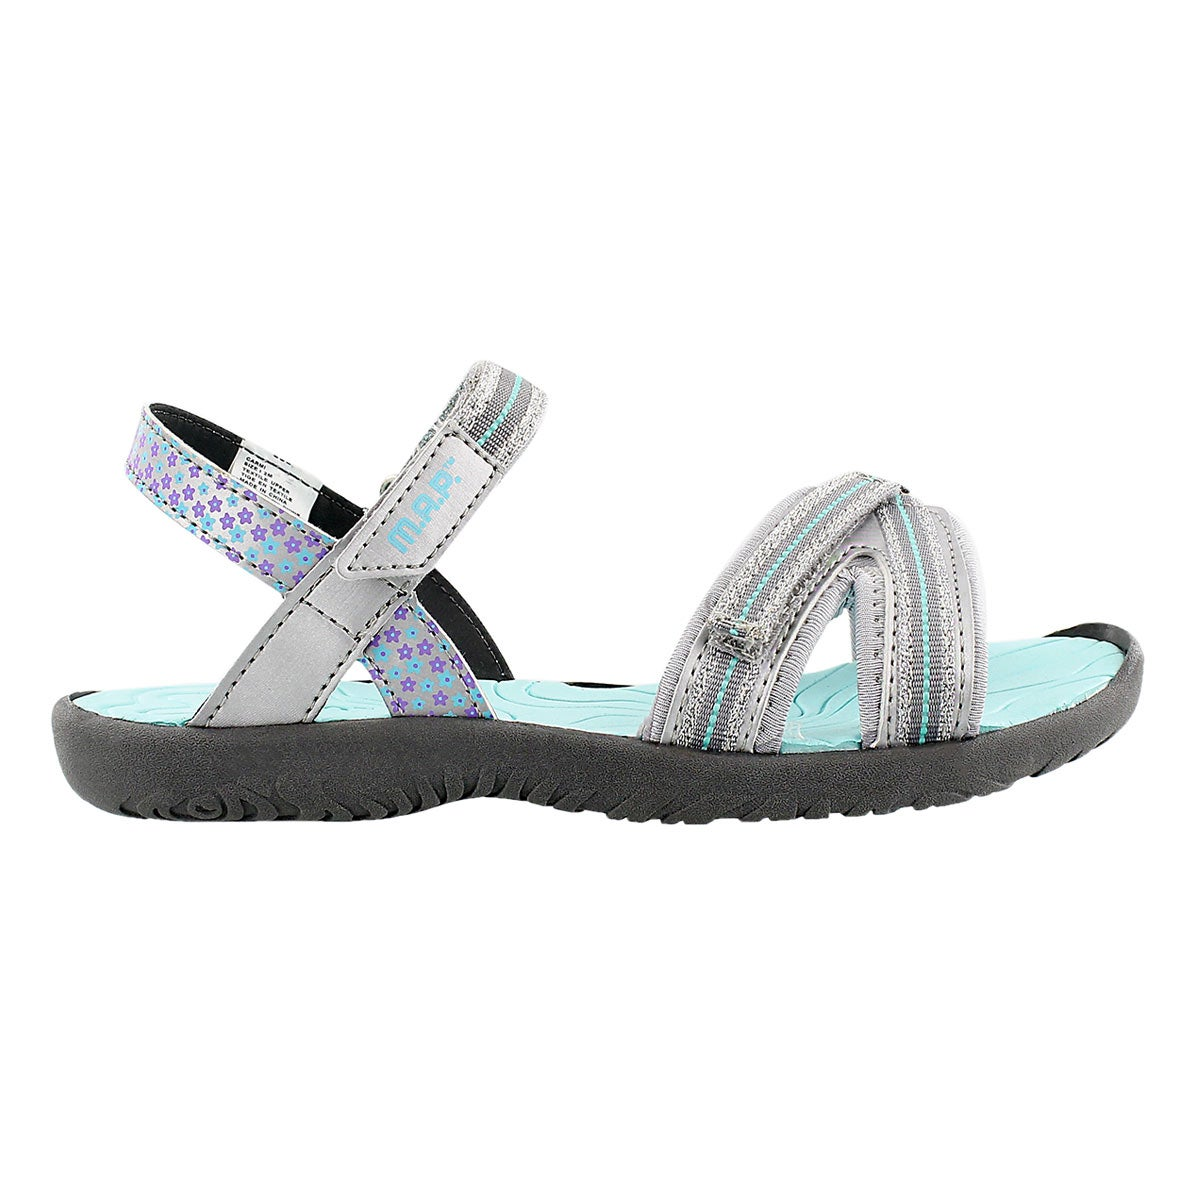 Grls Carmi silver/turq casual sandal